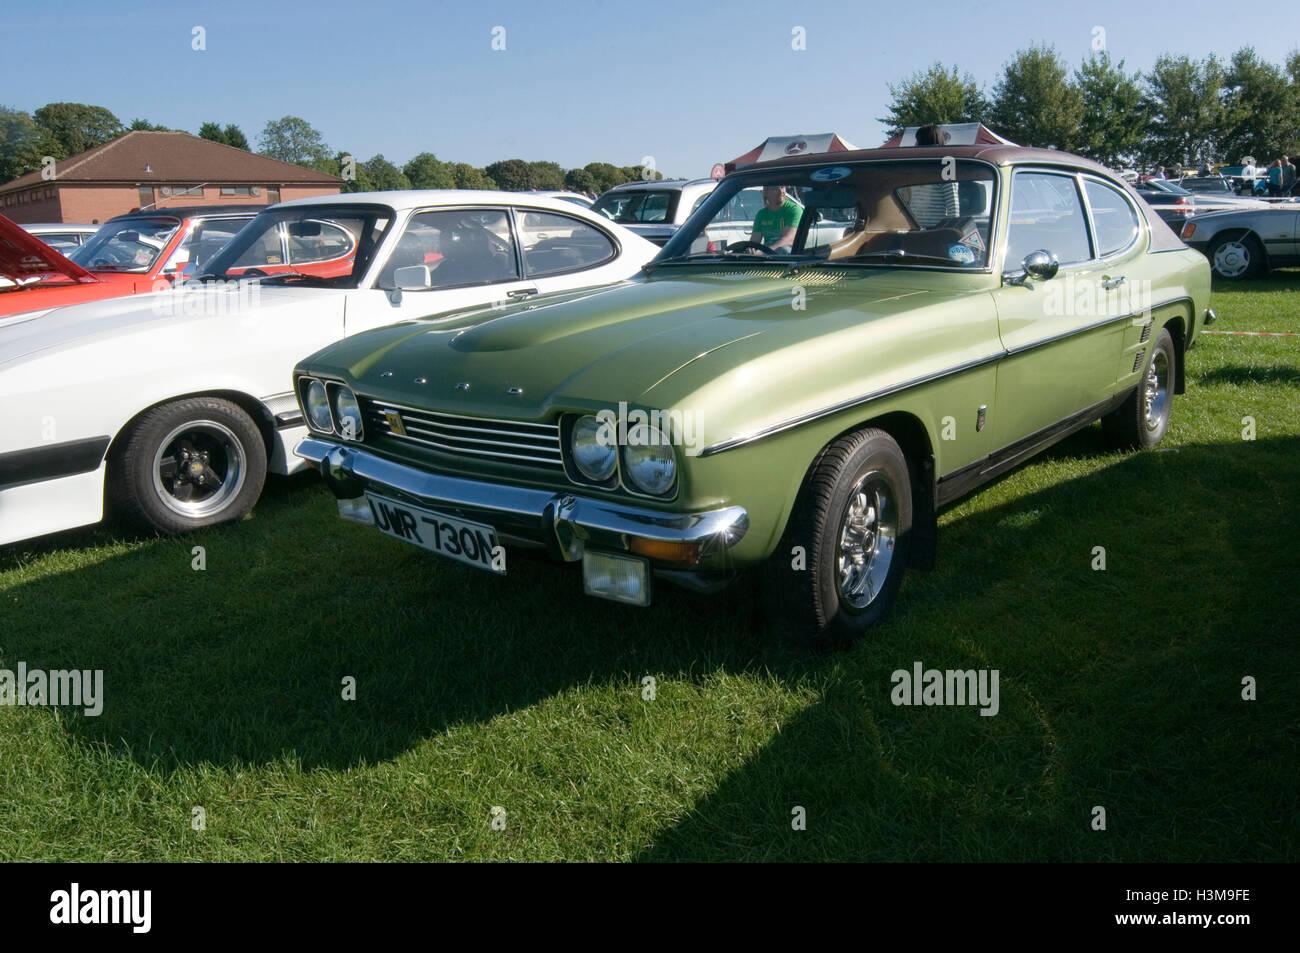 mk 1 mark one ford capri seventies nineteen 70's - Stock Image